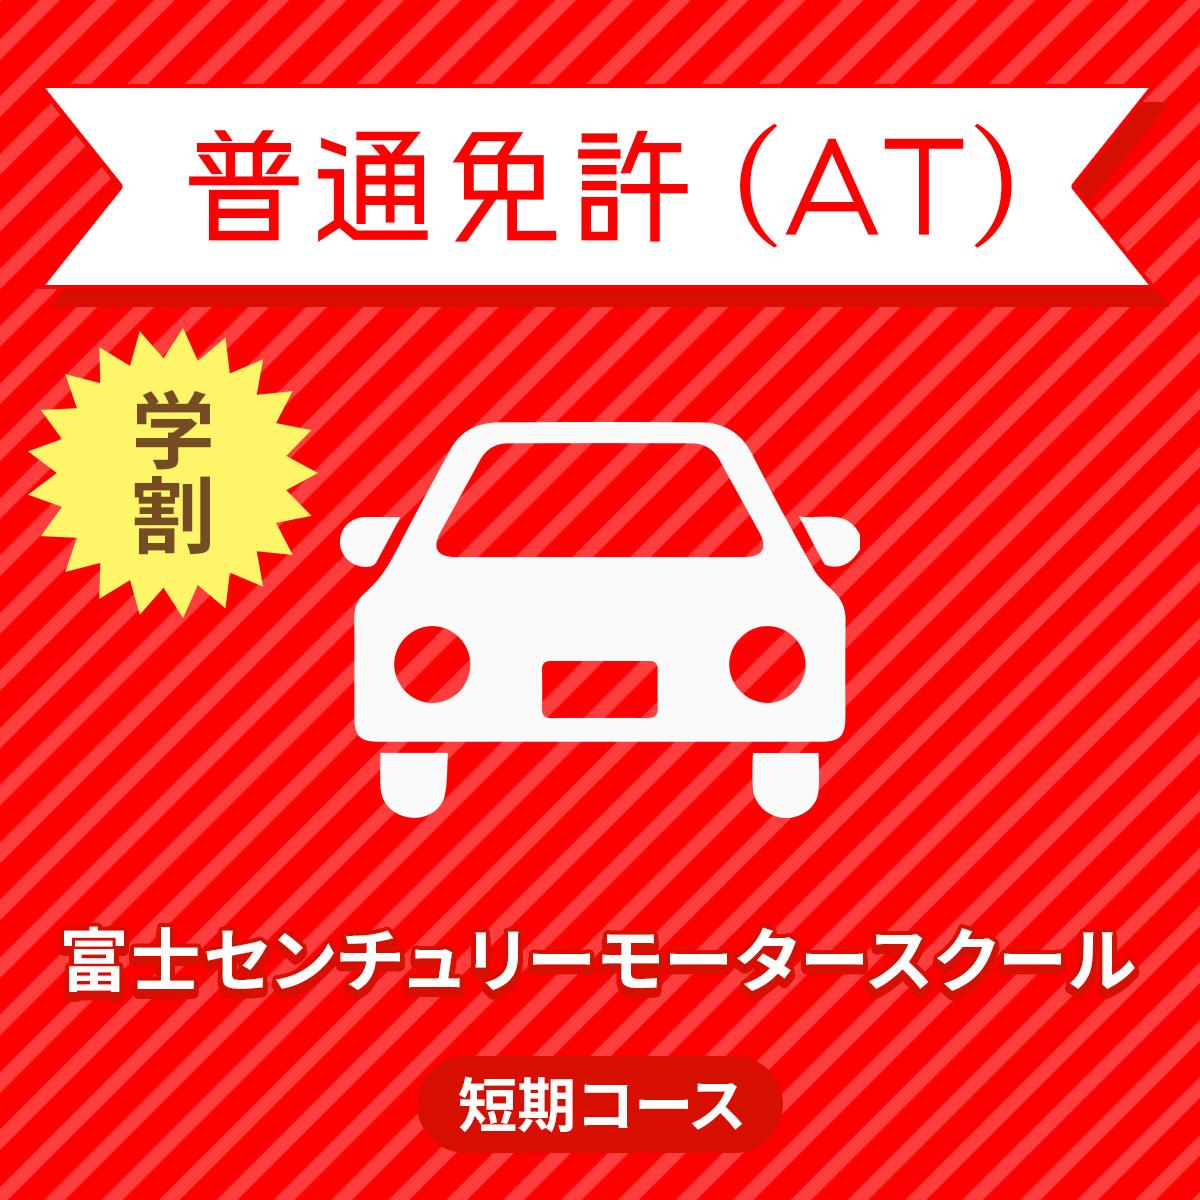 【静岡県裾野市】普通車AT短期コース(高校生料金)<免許なし/原付免許所持対象>